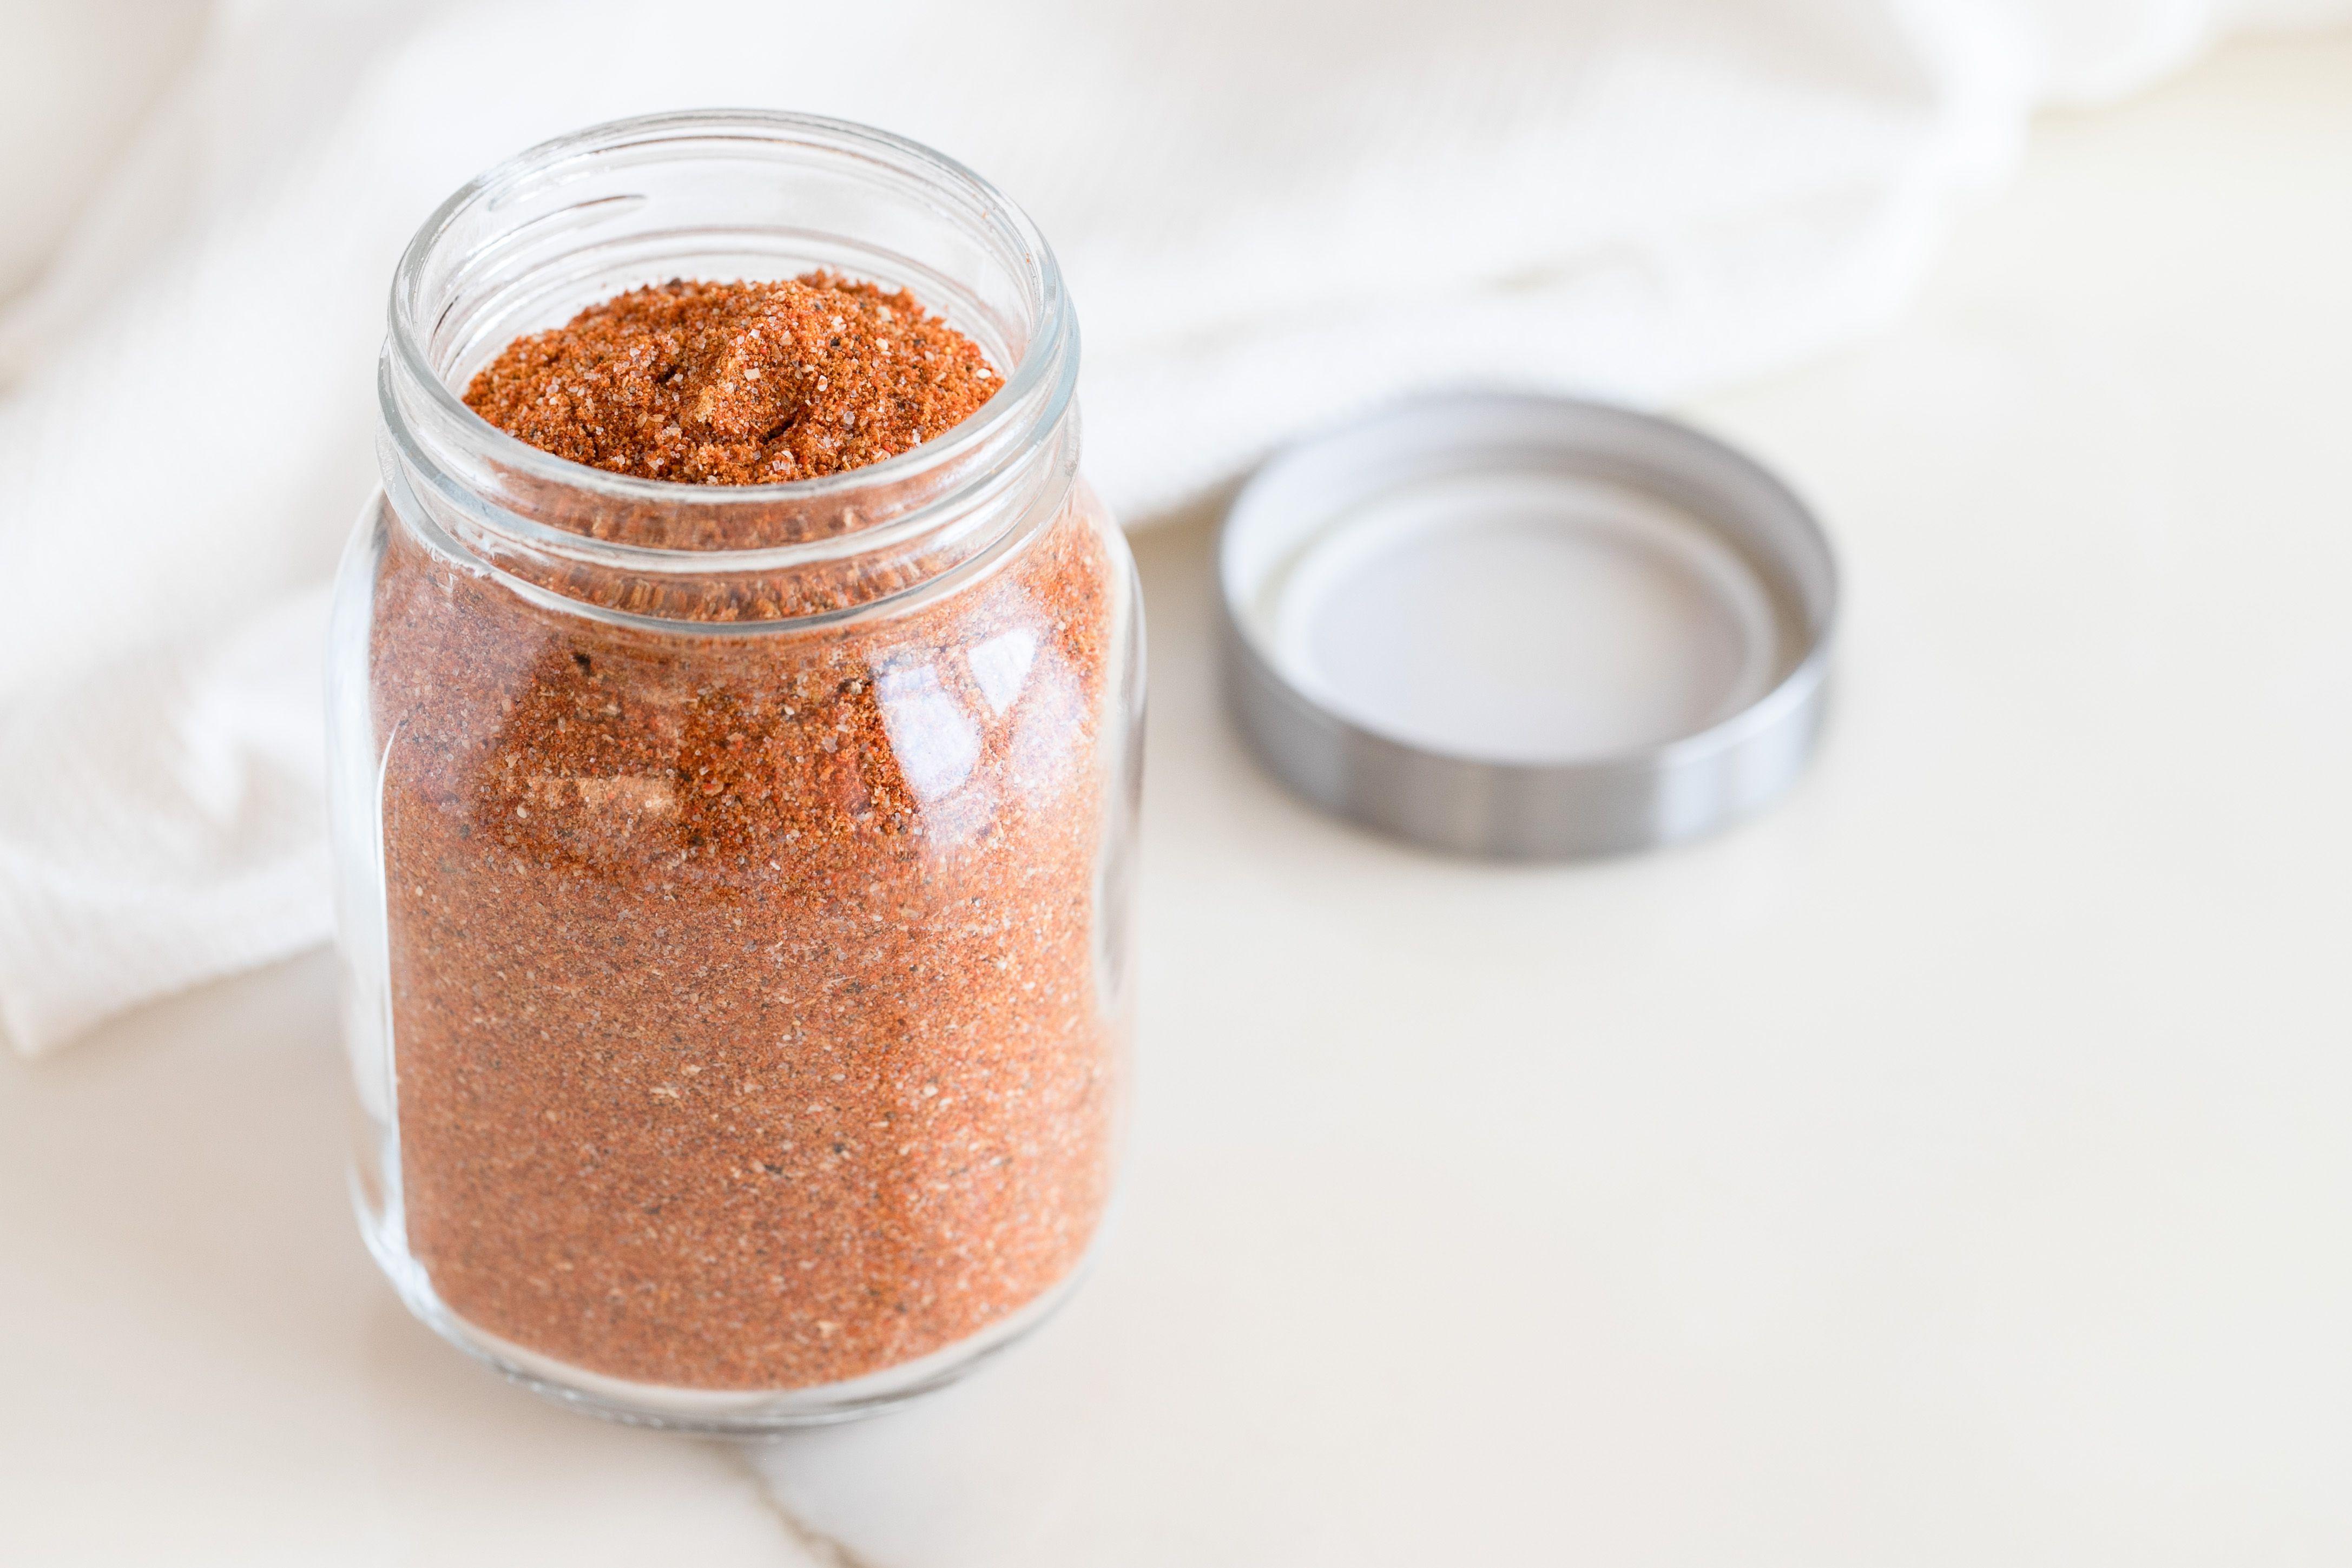 Magic dust spice rub